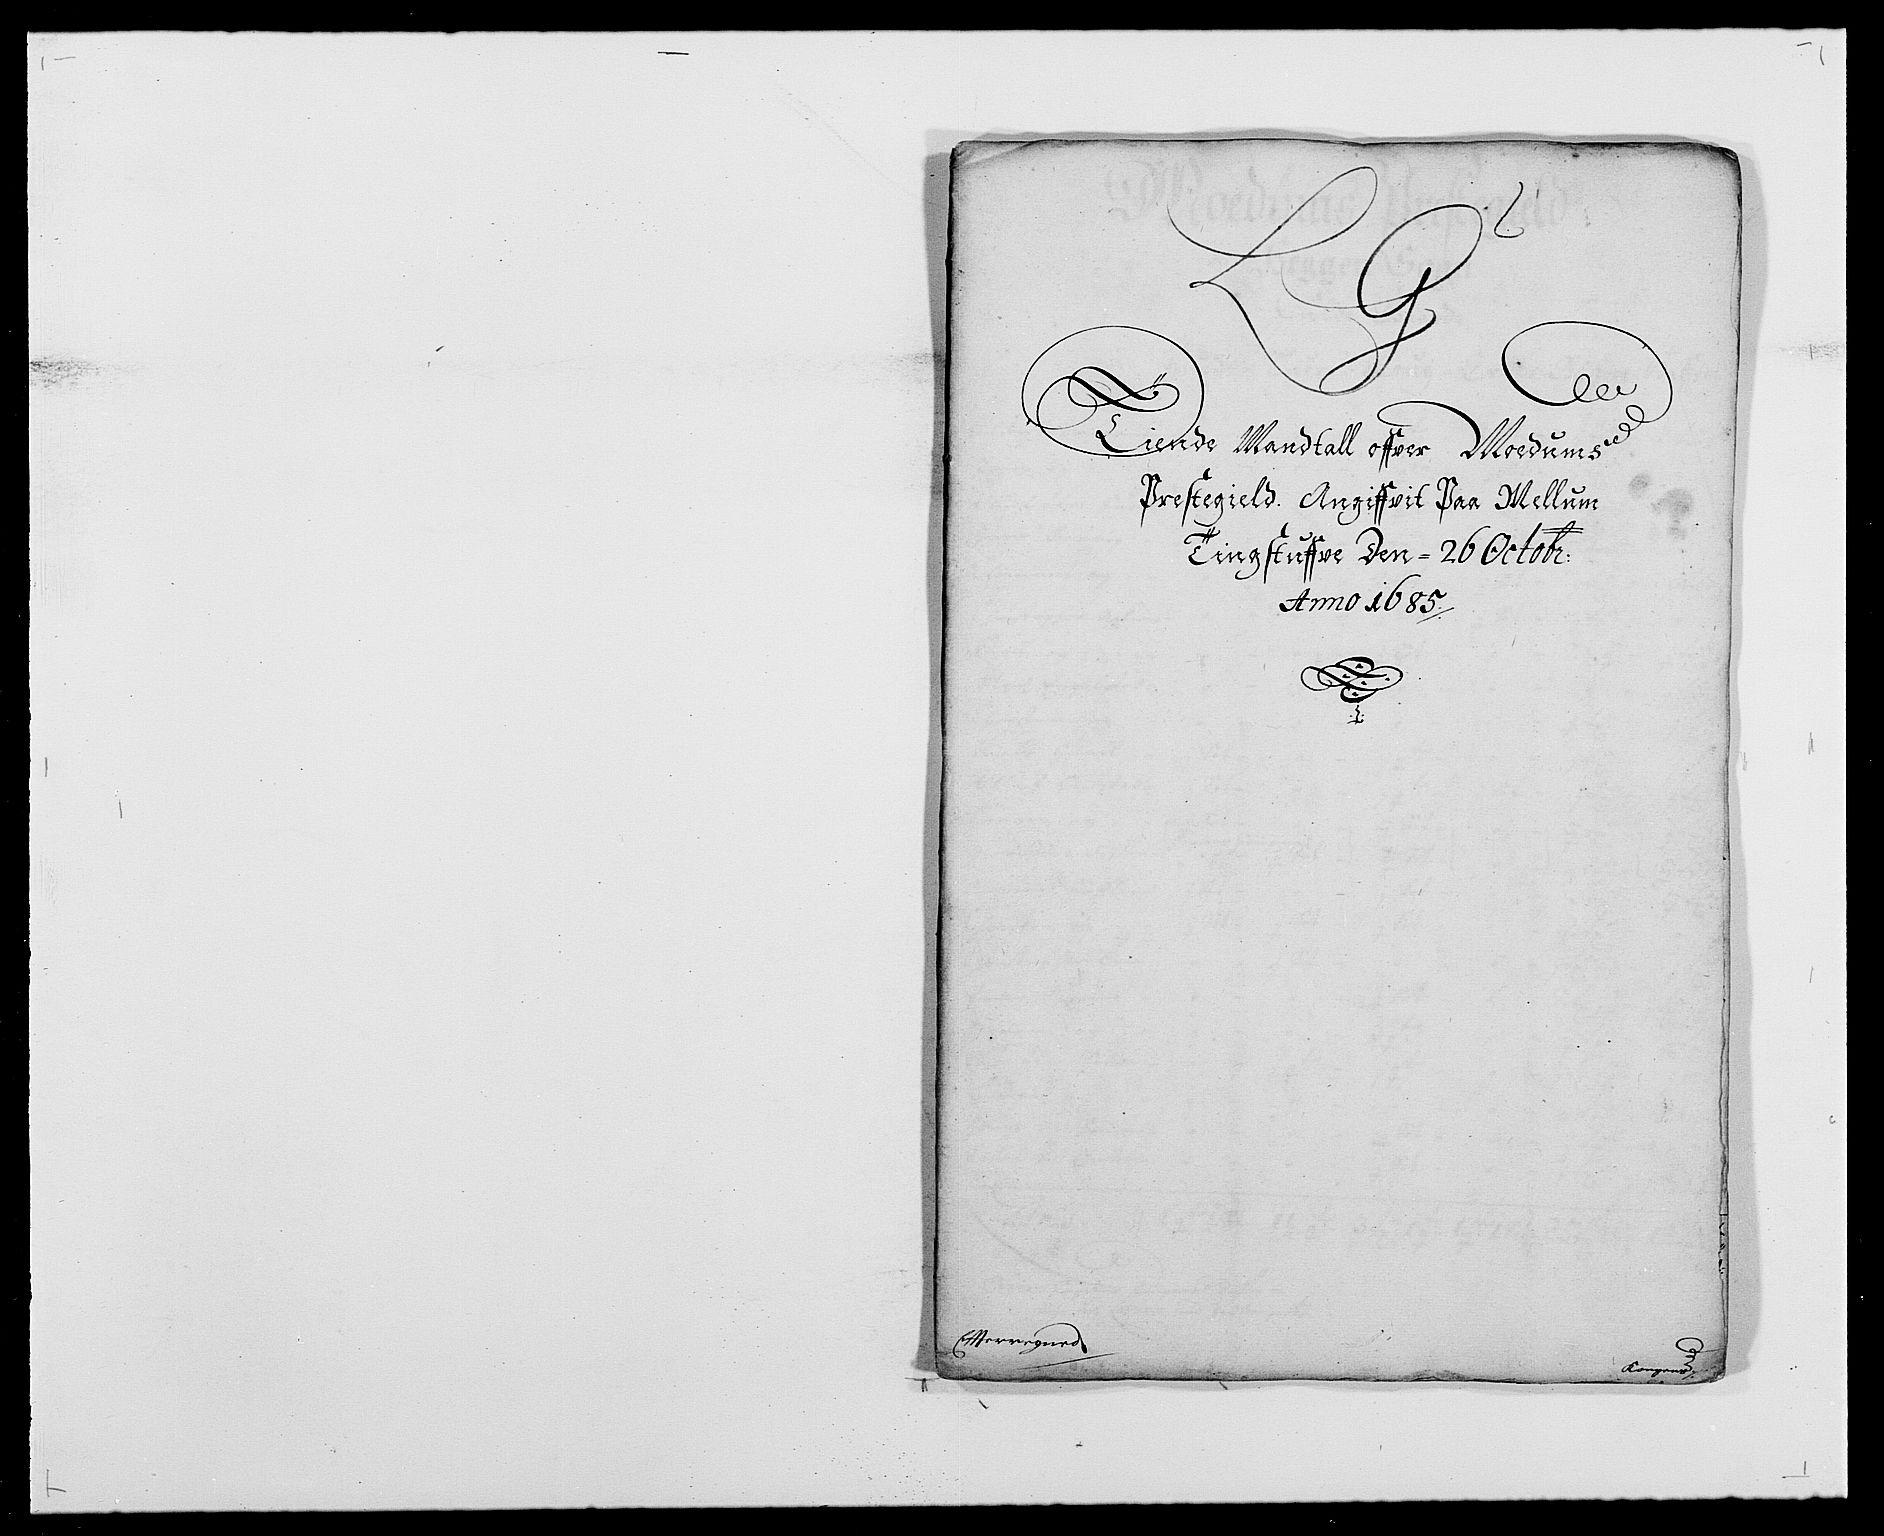 RA, Rentekammeret inntil 1814, Reviderte regnskaper, Fogderegnskap, R25/L1678: Fogderegnskap Buskerud, 1685-1686, s. 125